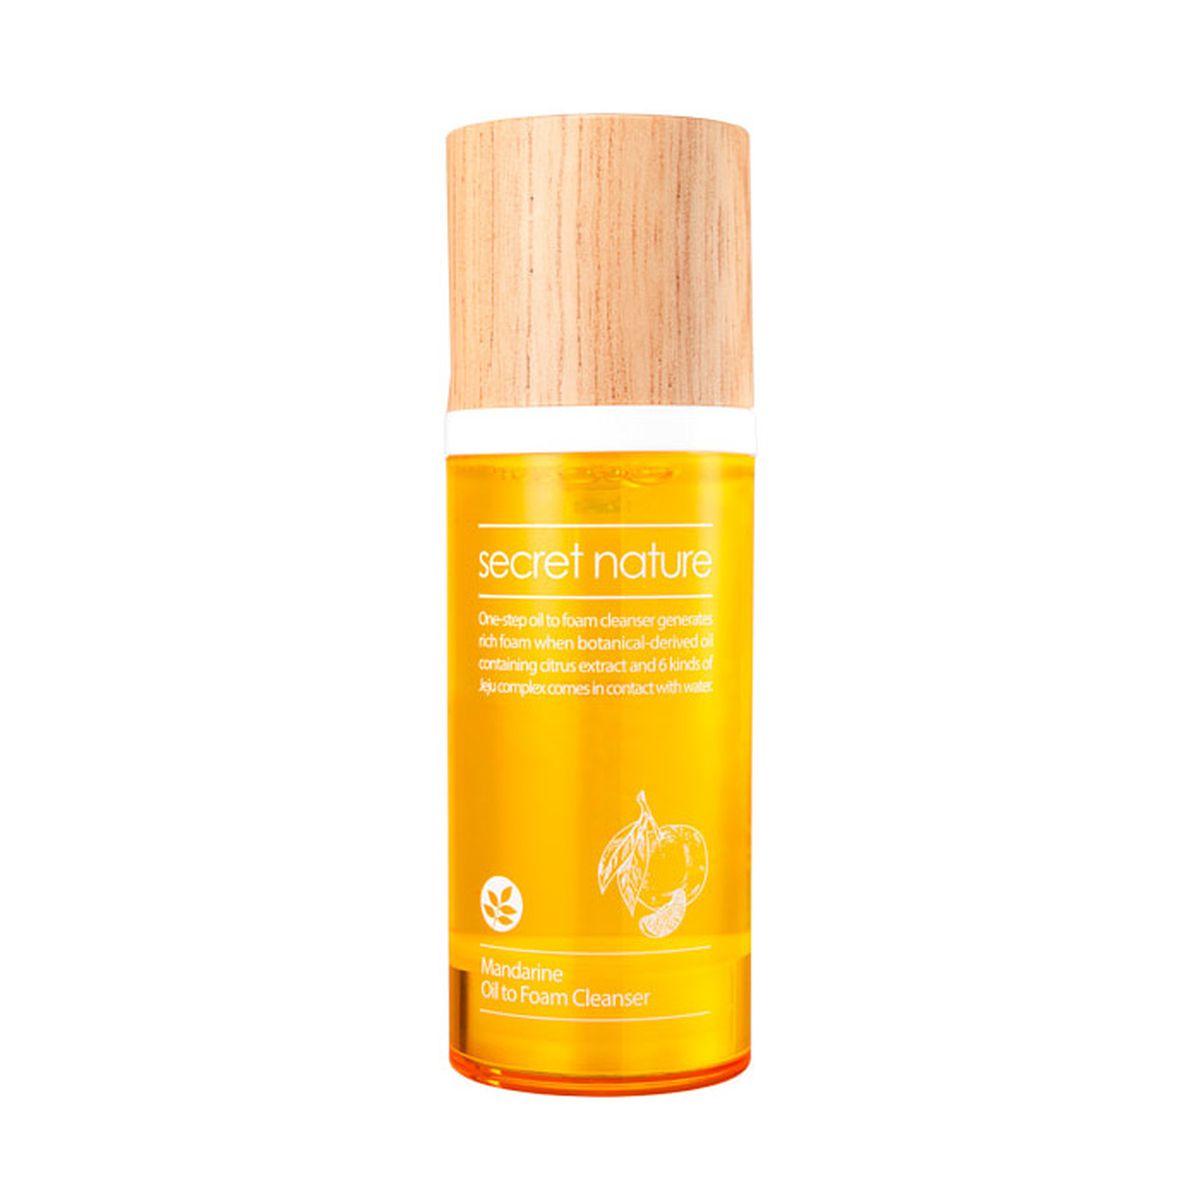 Гидрофильное масло-пенка с мандарином Secter Nature Mandarine Oil to Foam Cleanser - 100 мл